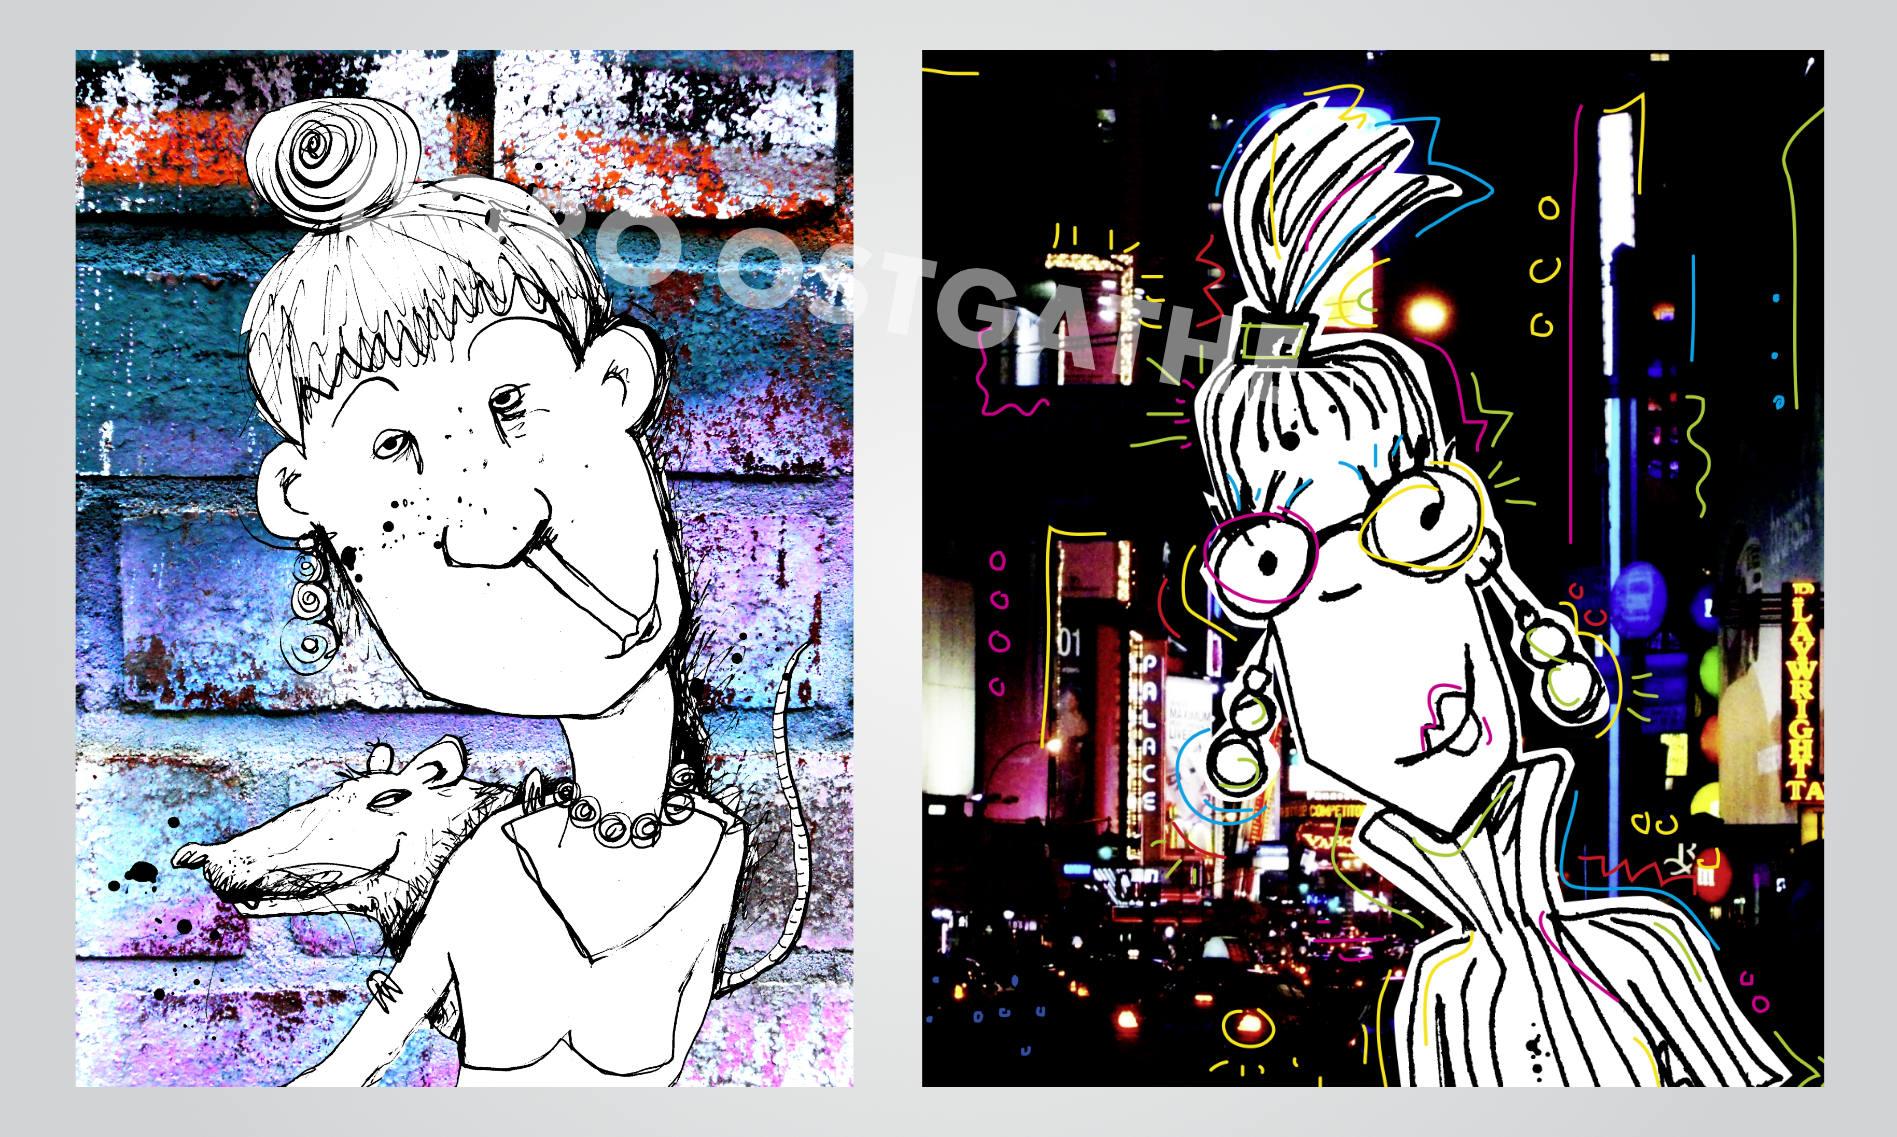 illustration-kunst-art-ostgathe-06.jpg